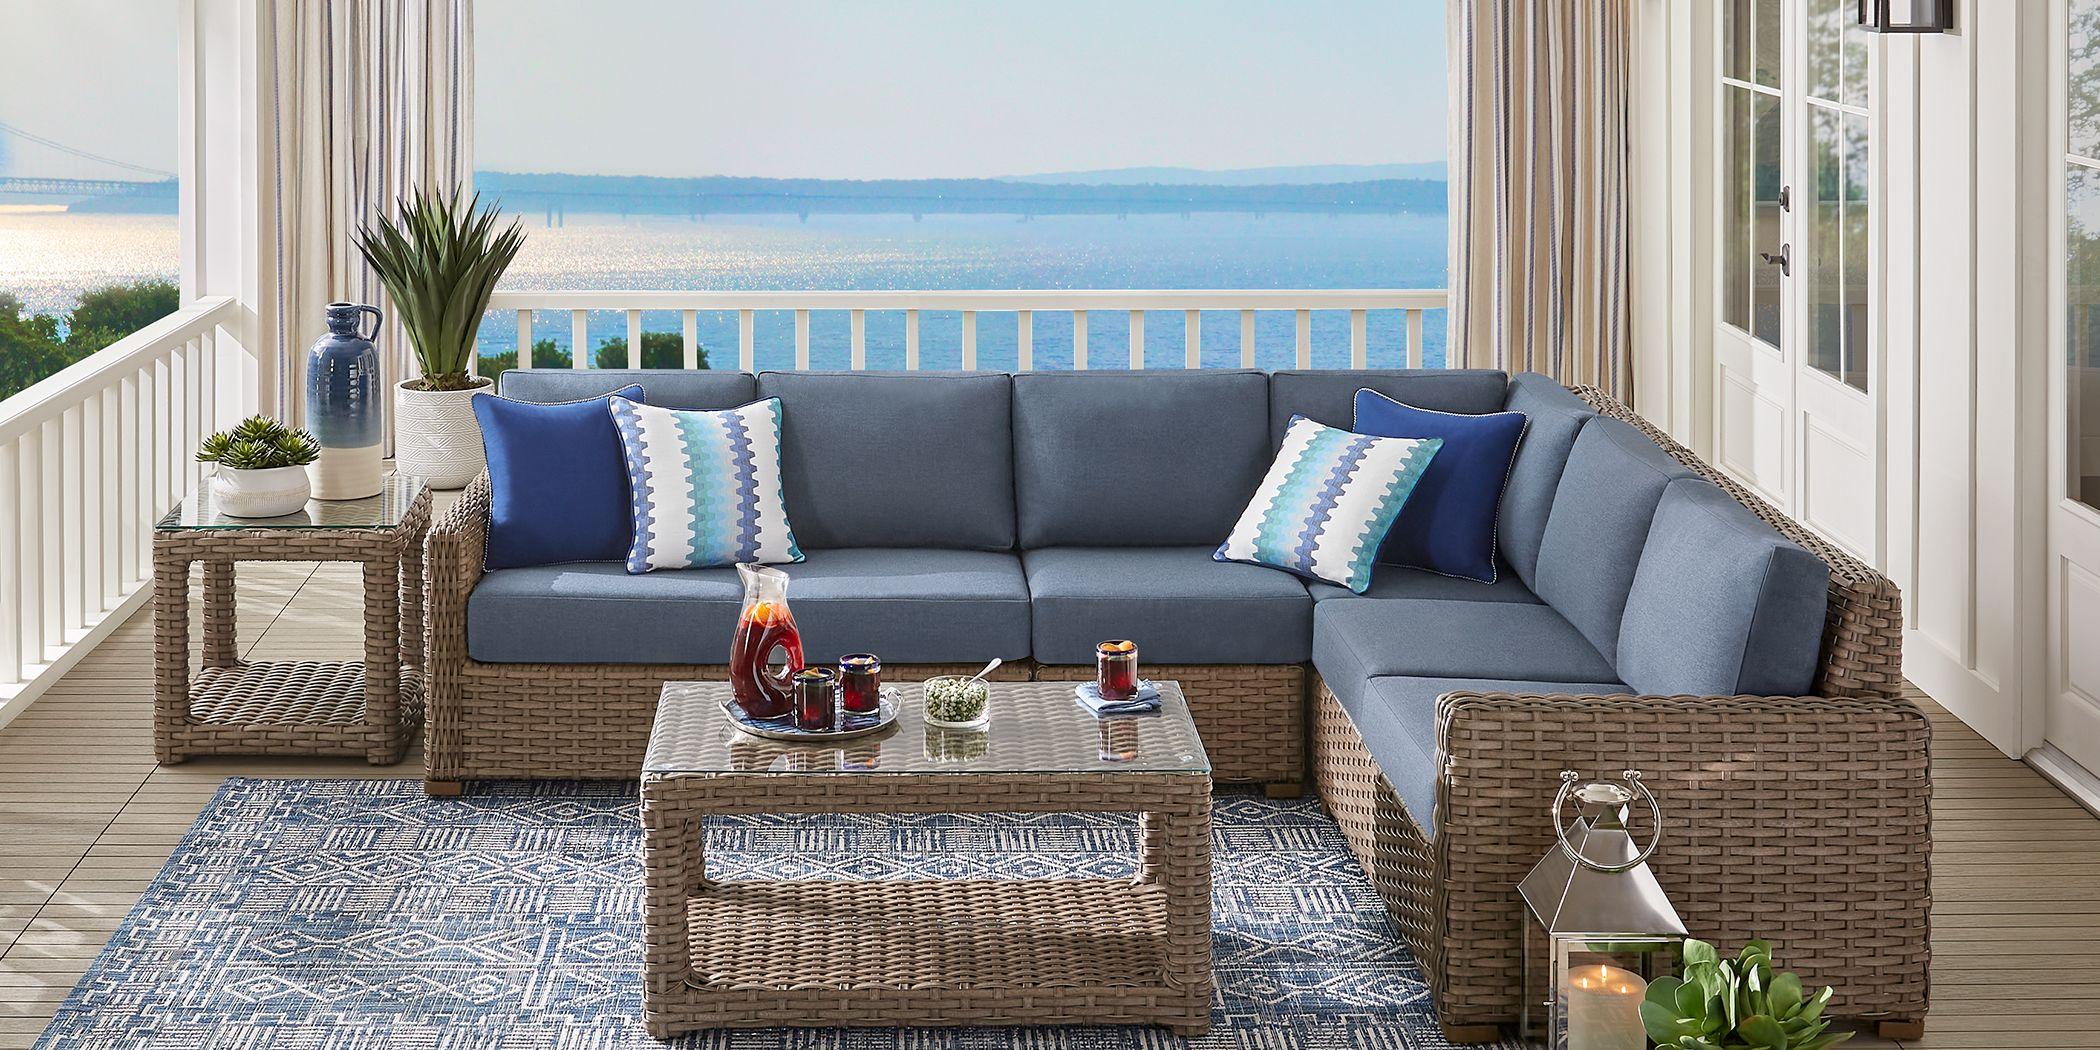 Siesta Key Driftwood 5 Pc Outdoor Seating Set with Indigo Cushions